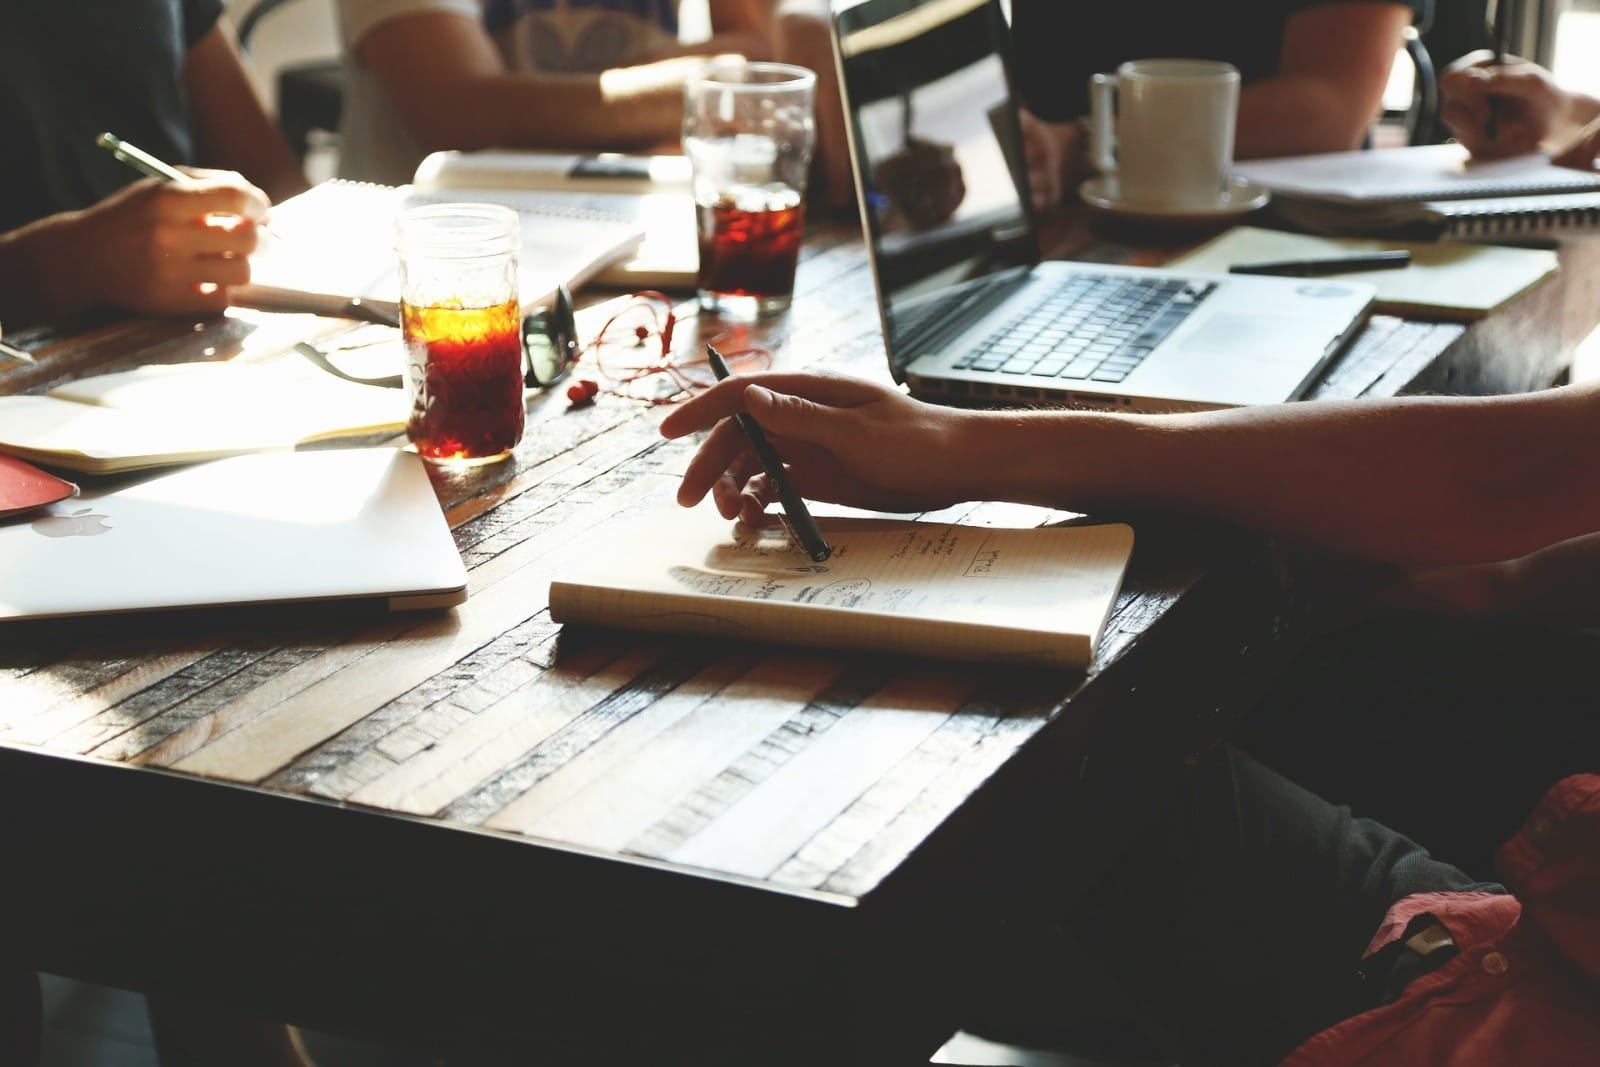 startup employees working